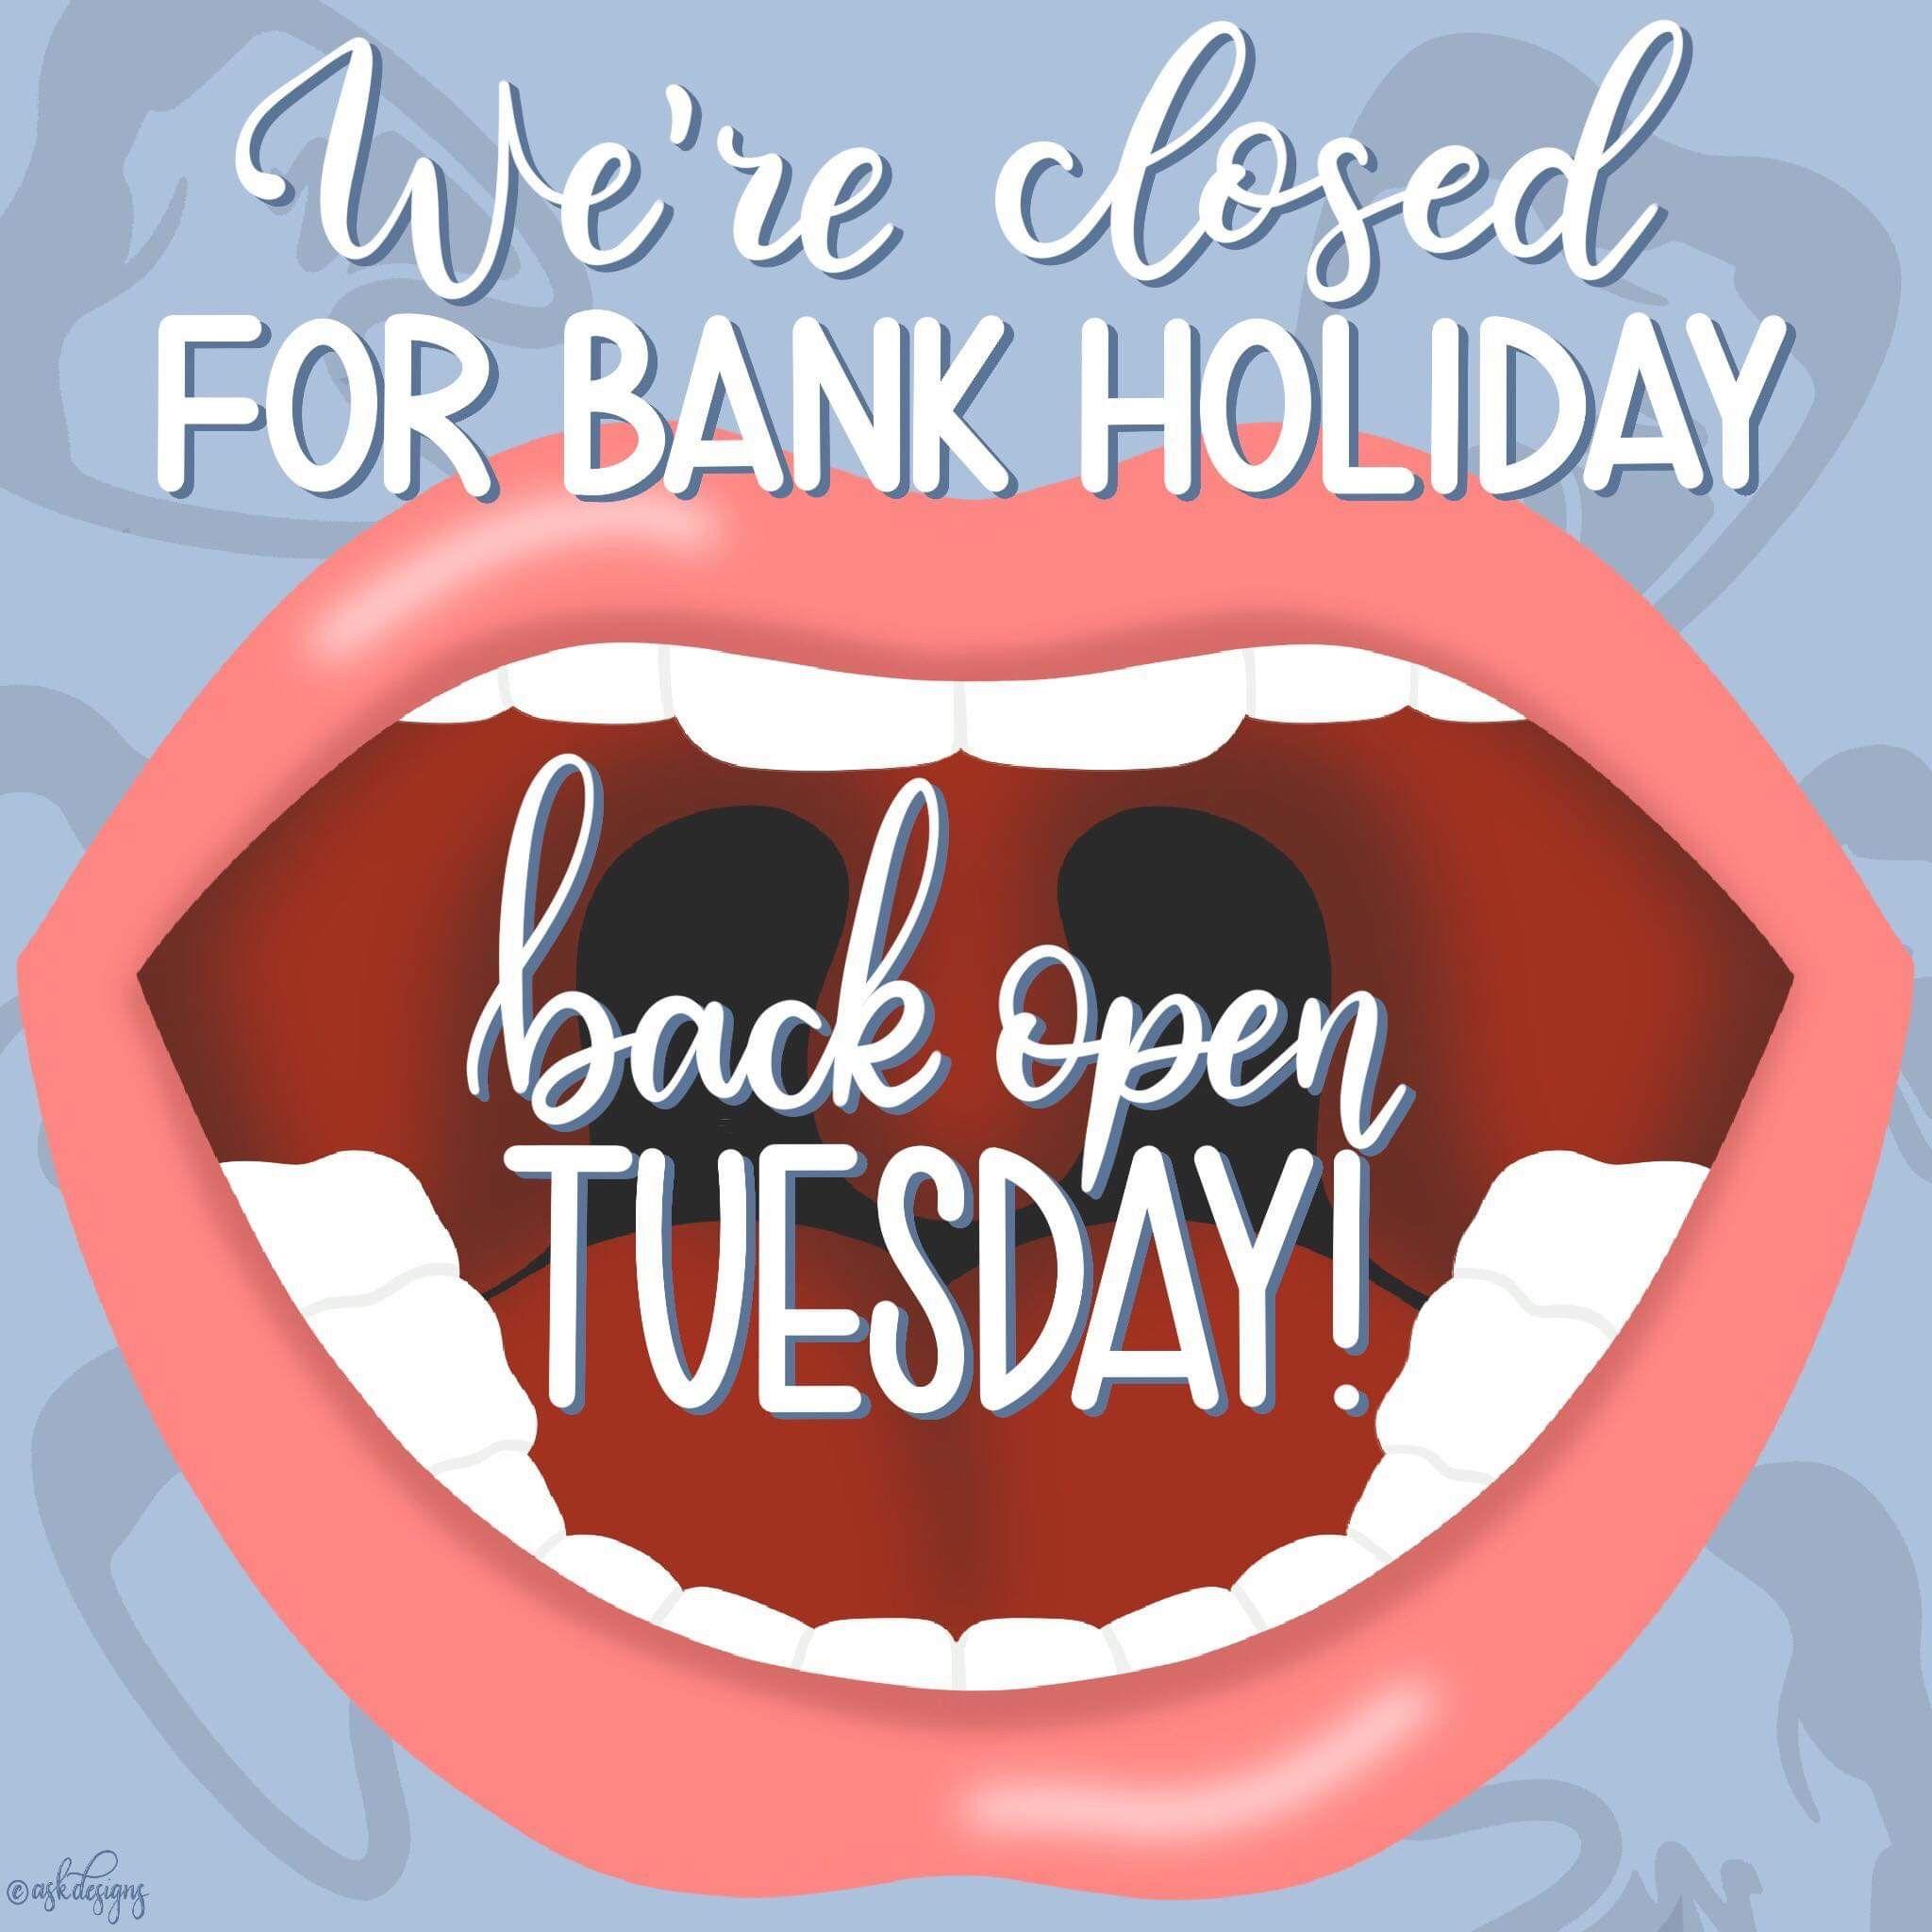 Bank Holiday Dental emergency, Emergency dentist, Bank